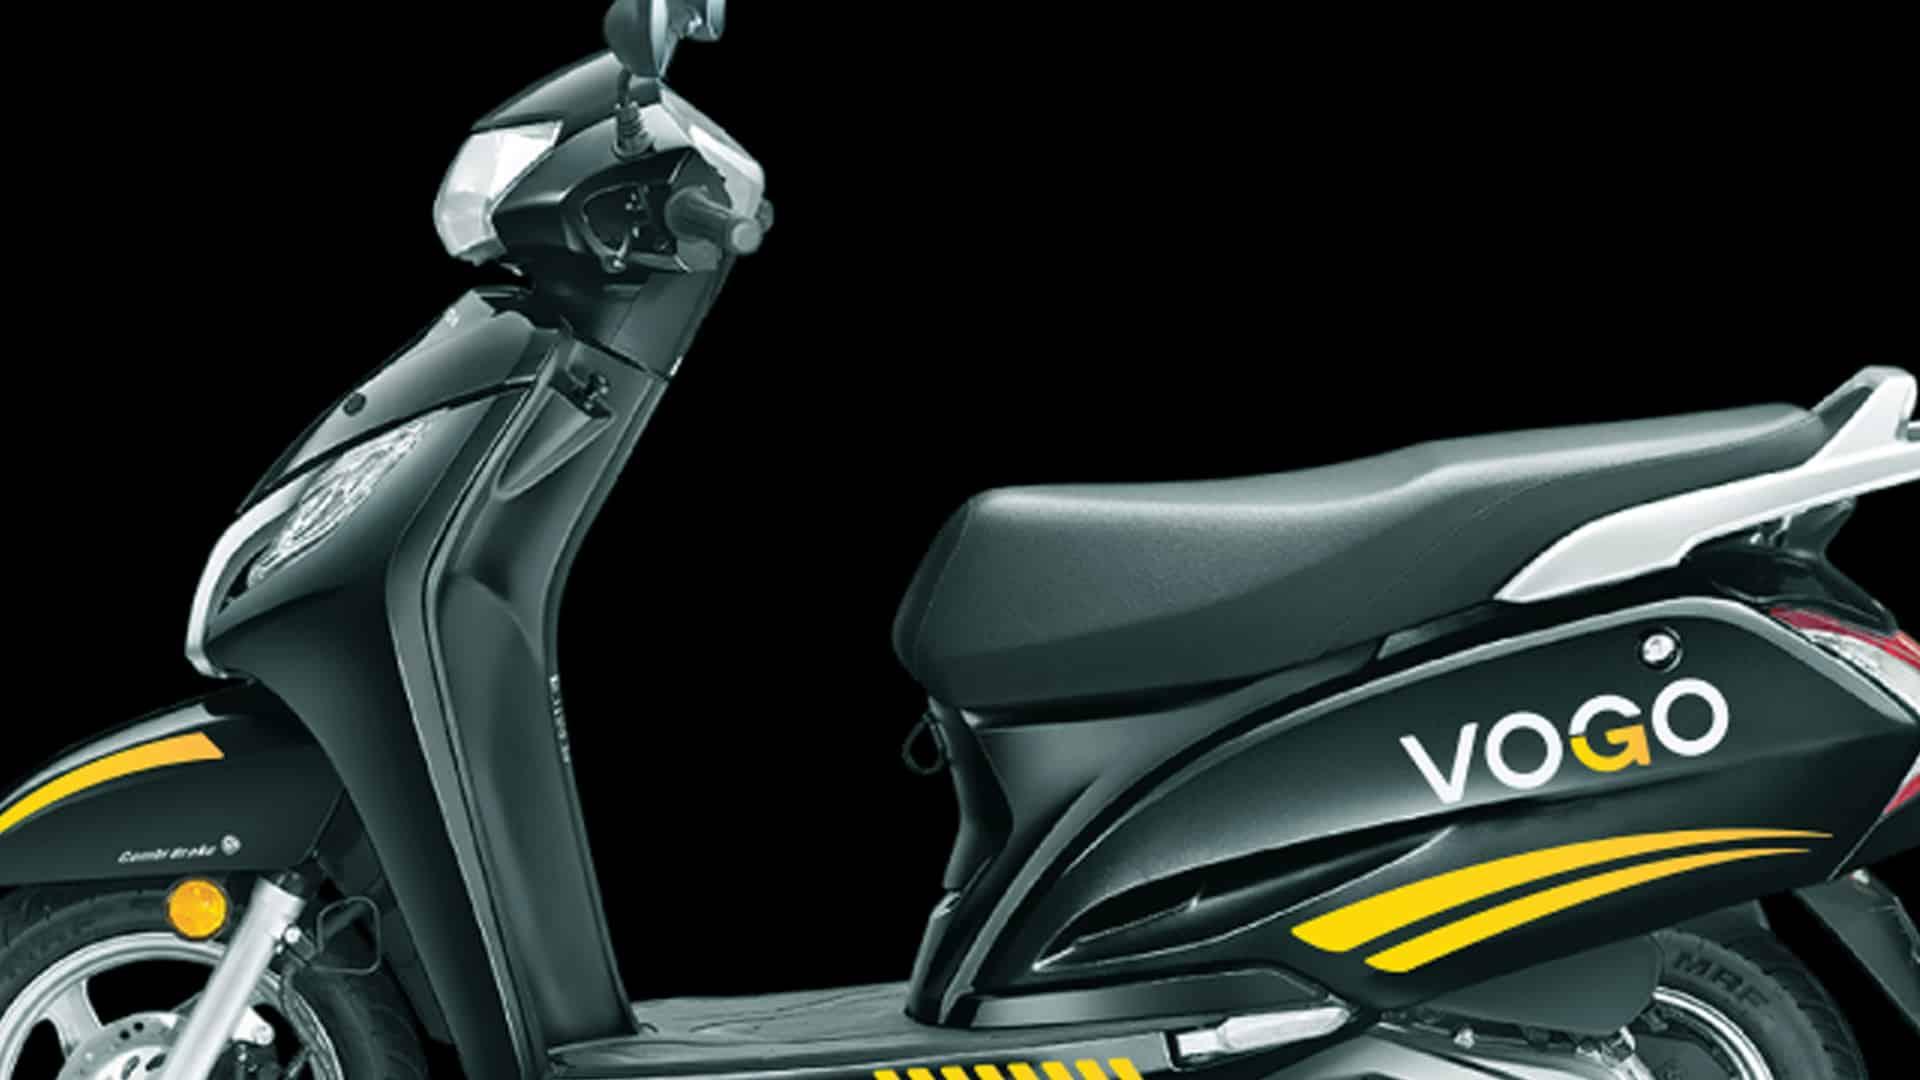 Vogo raises USD 11.5 mn funding from Lightrock, Kalaari, others